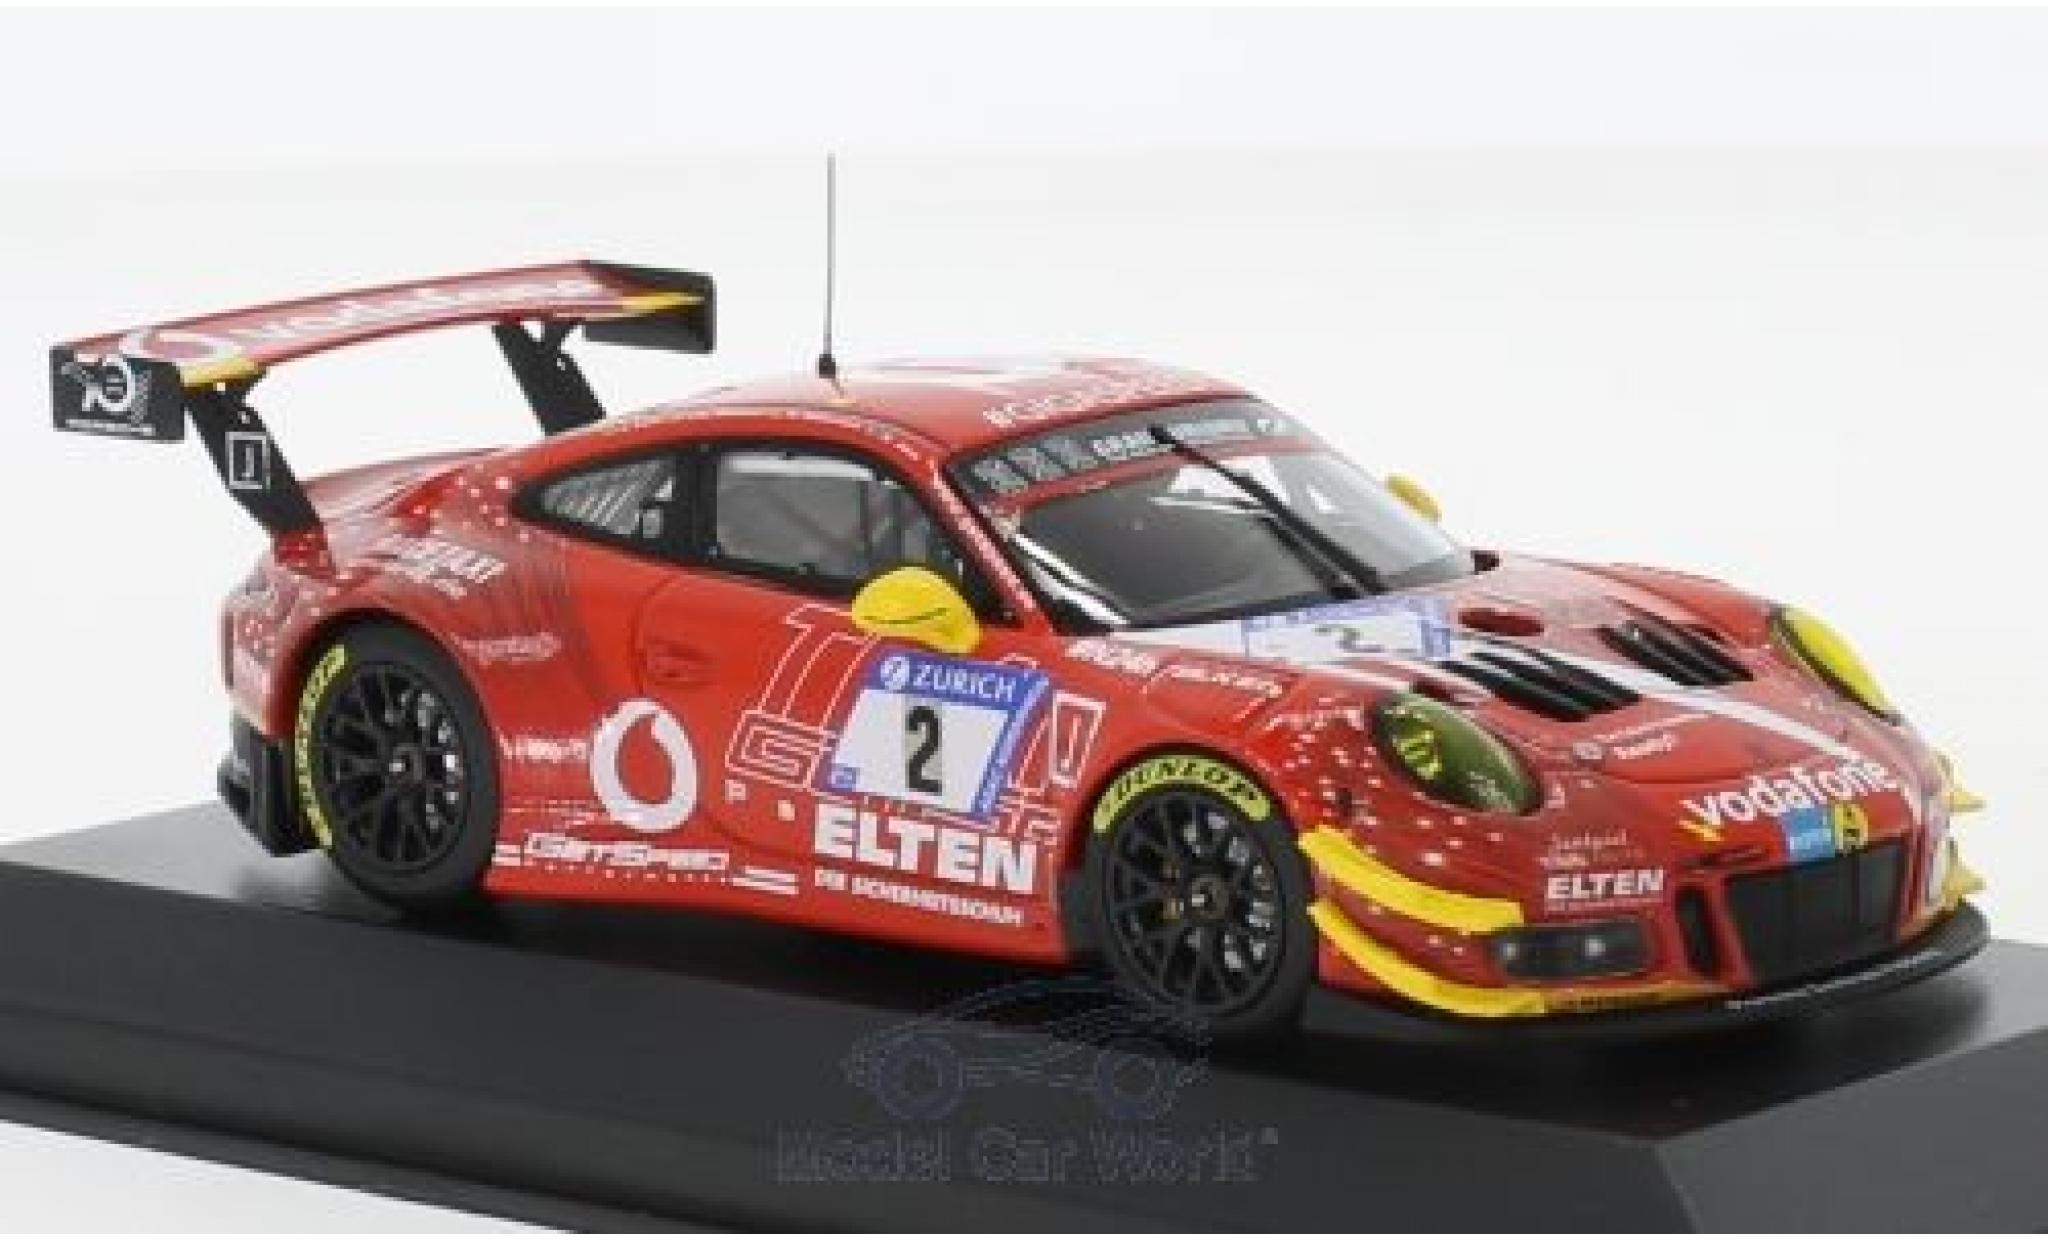 Porsche 911 1/43 Minichamps (991) GT3 R No.2 Gigaspeed Team 24h Nürburgring 2018 S.Jans/M.Böckmann/J-E.Slooten/L.Luhr